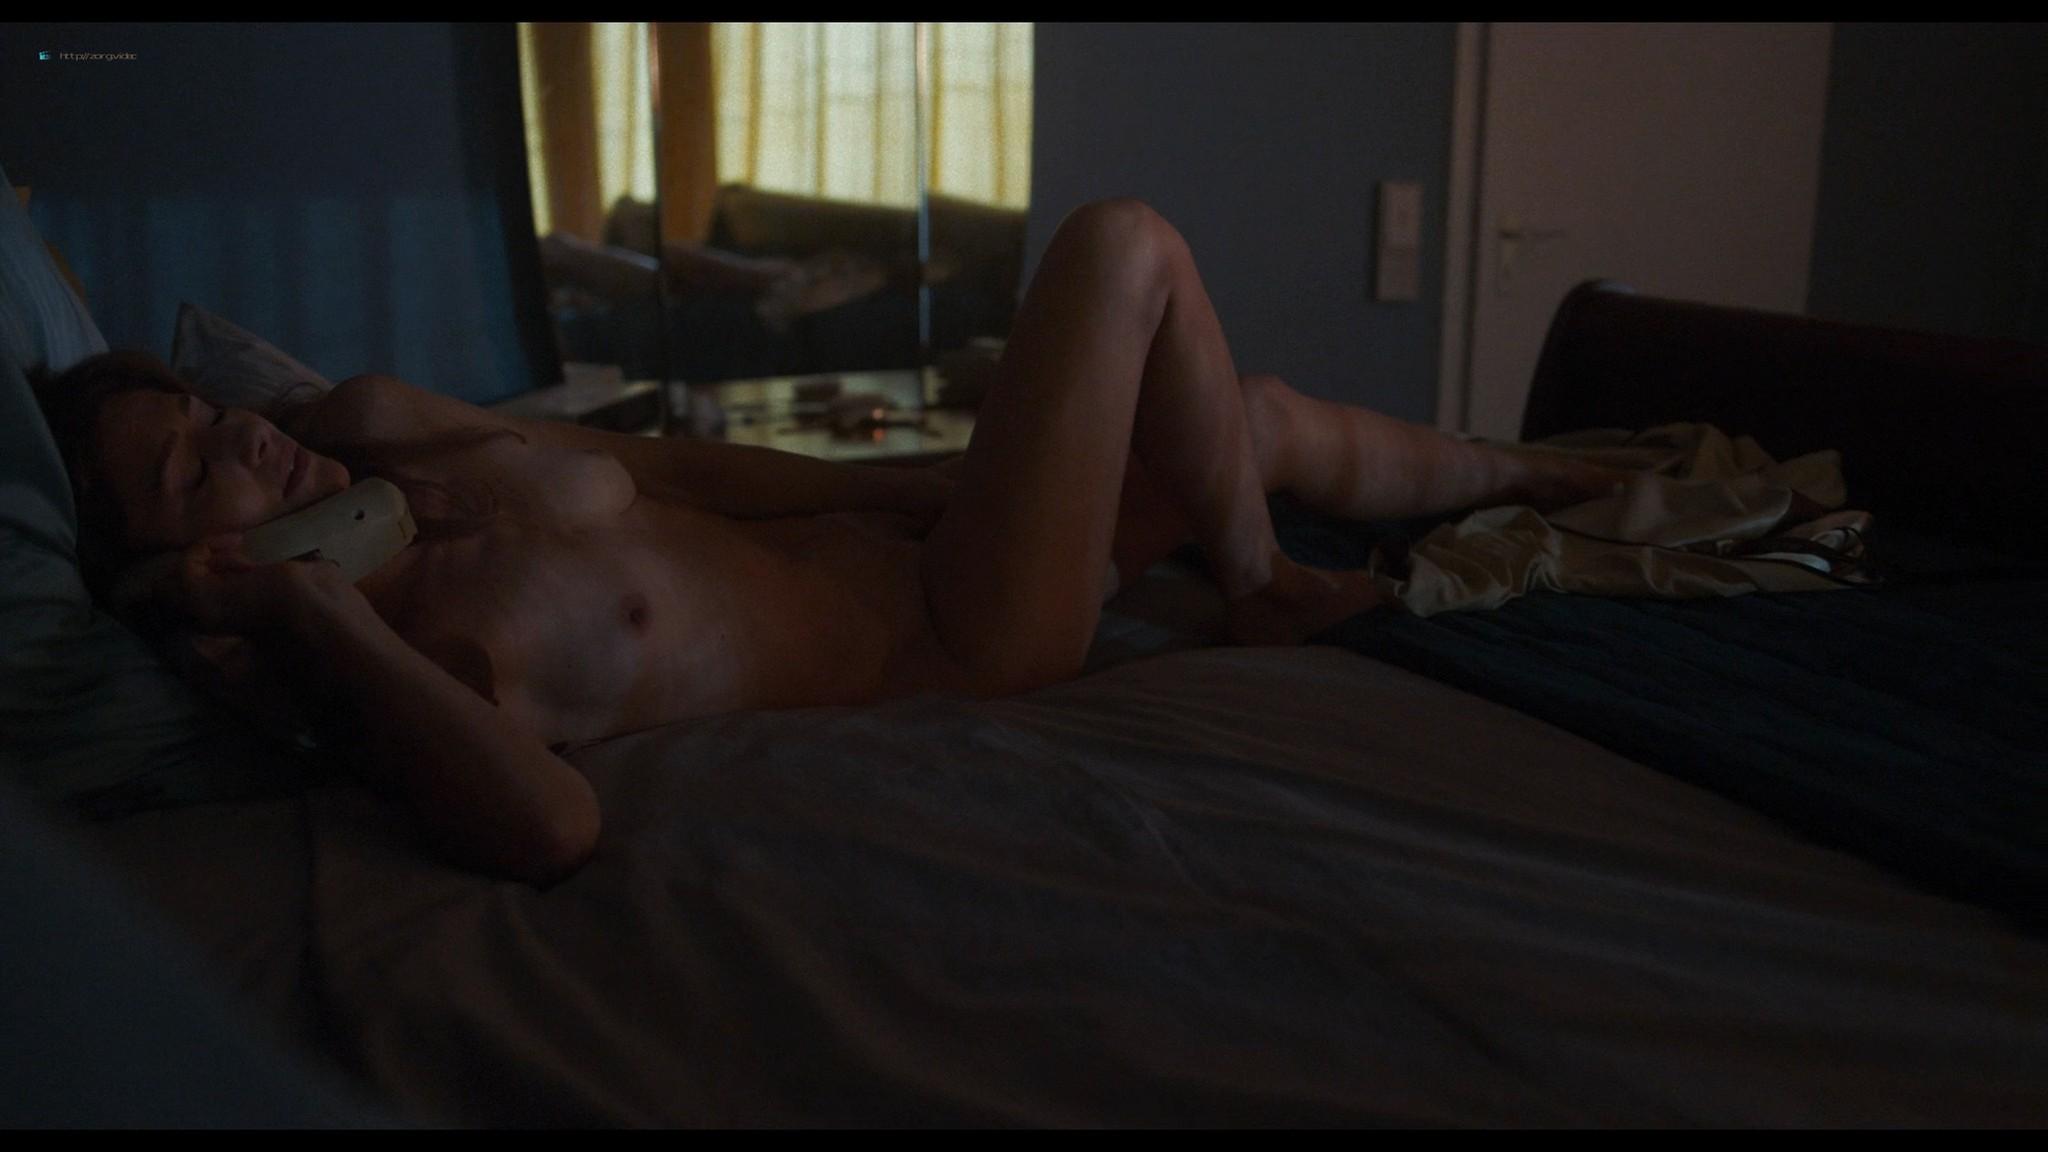 Maria Fernanda Cândido nude Marilina Marino nude sex - The Traitor (2019) HD 1080p BluRay (7)